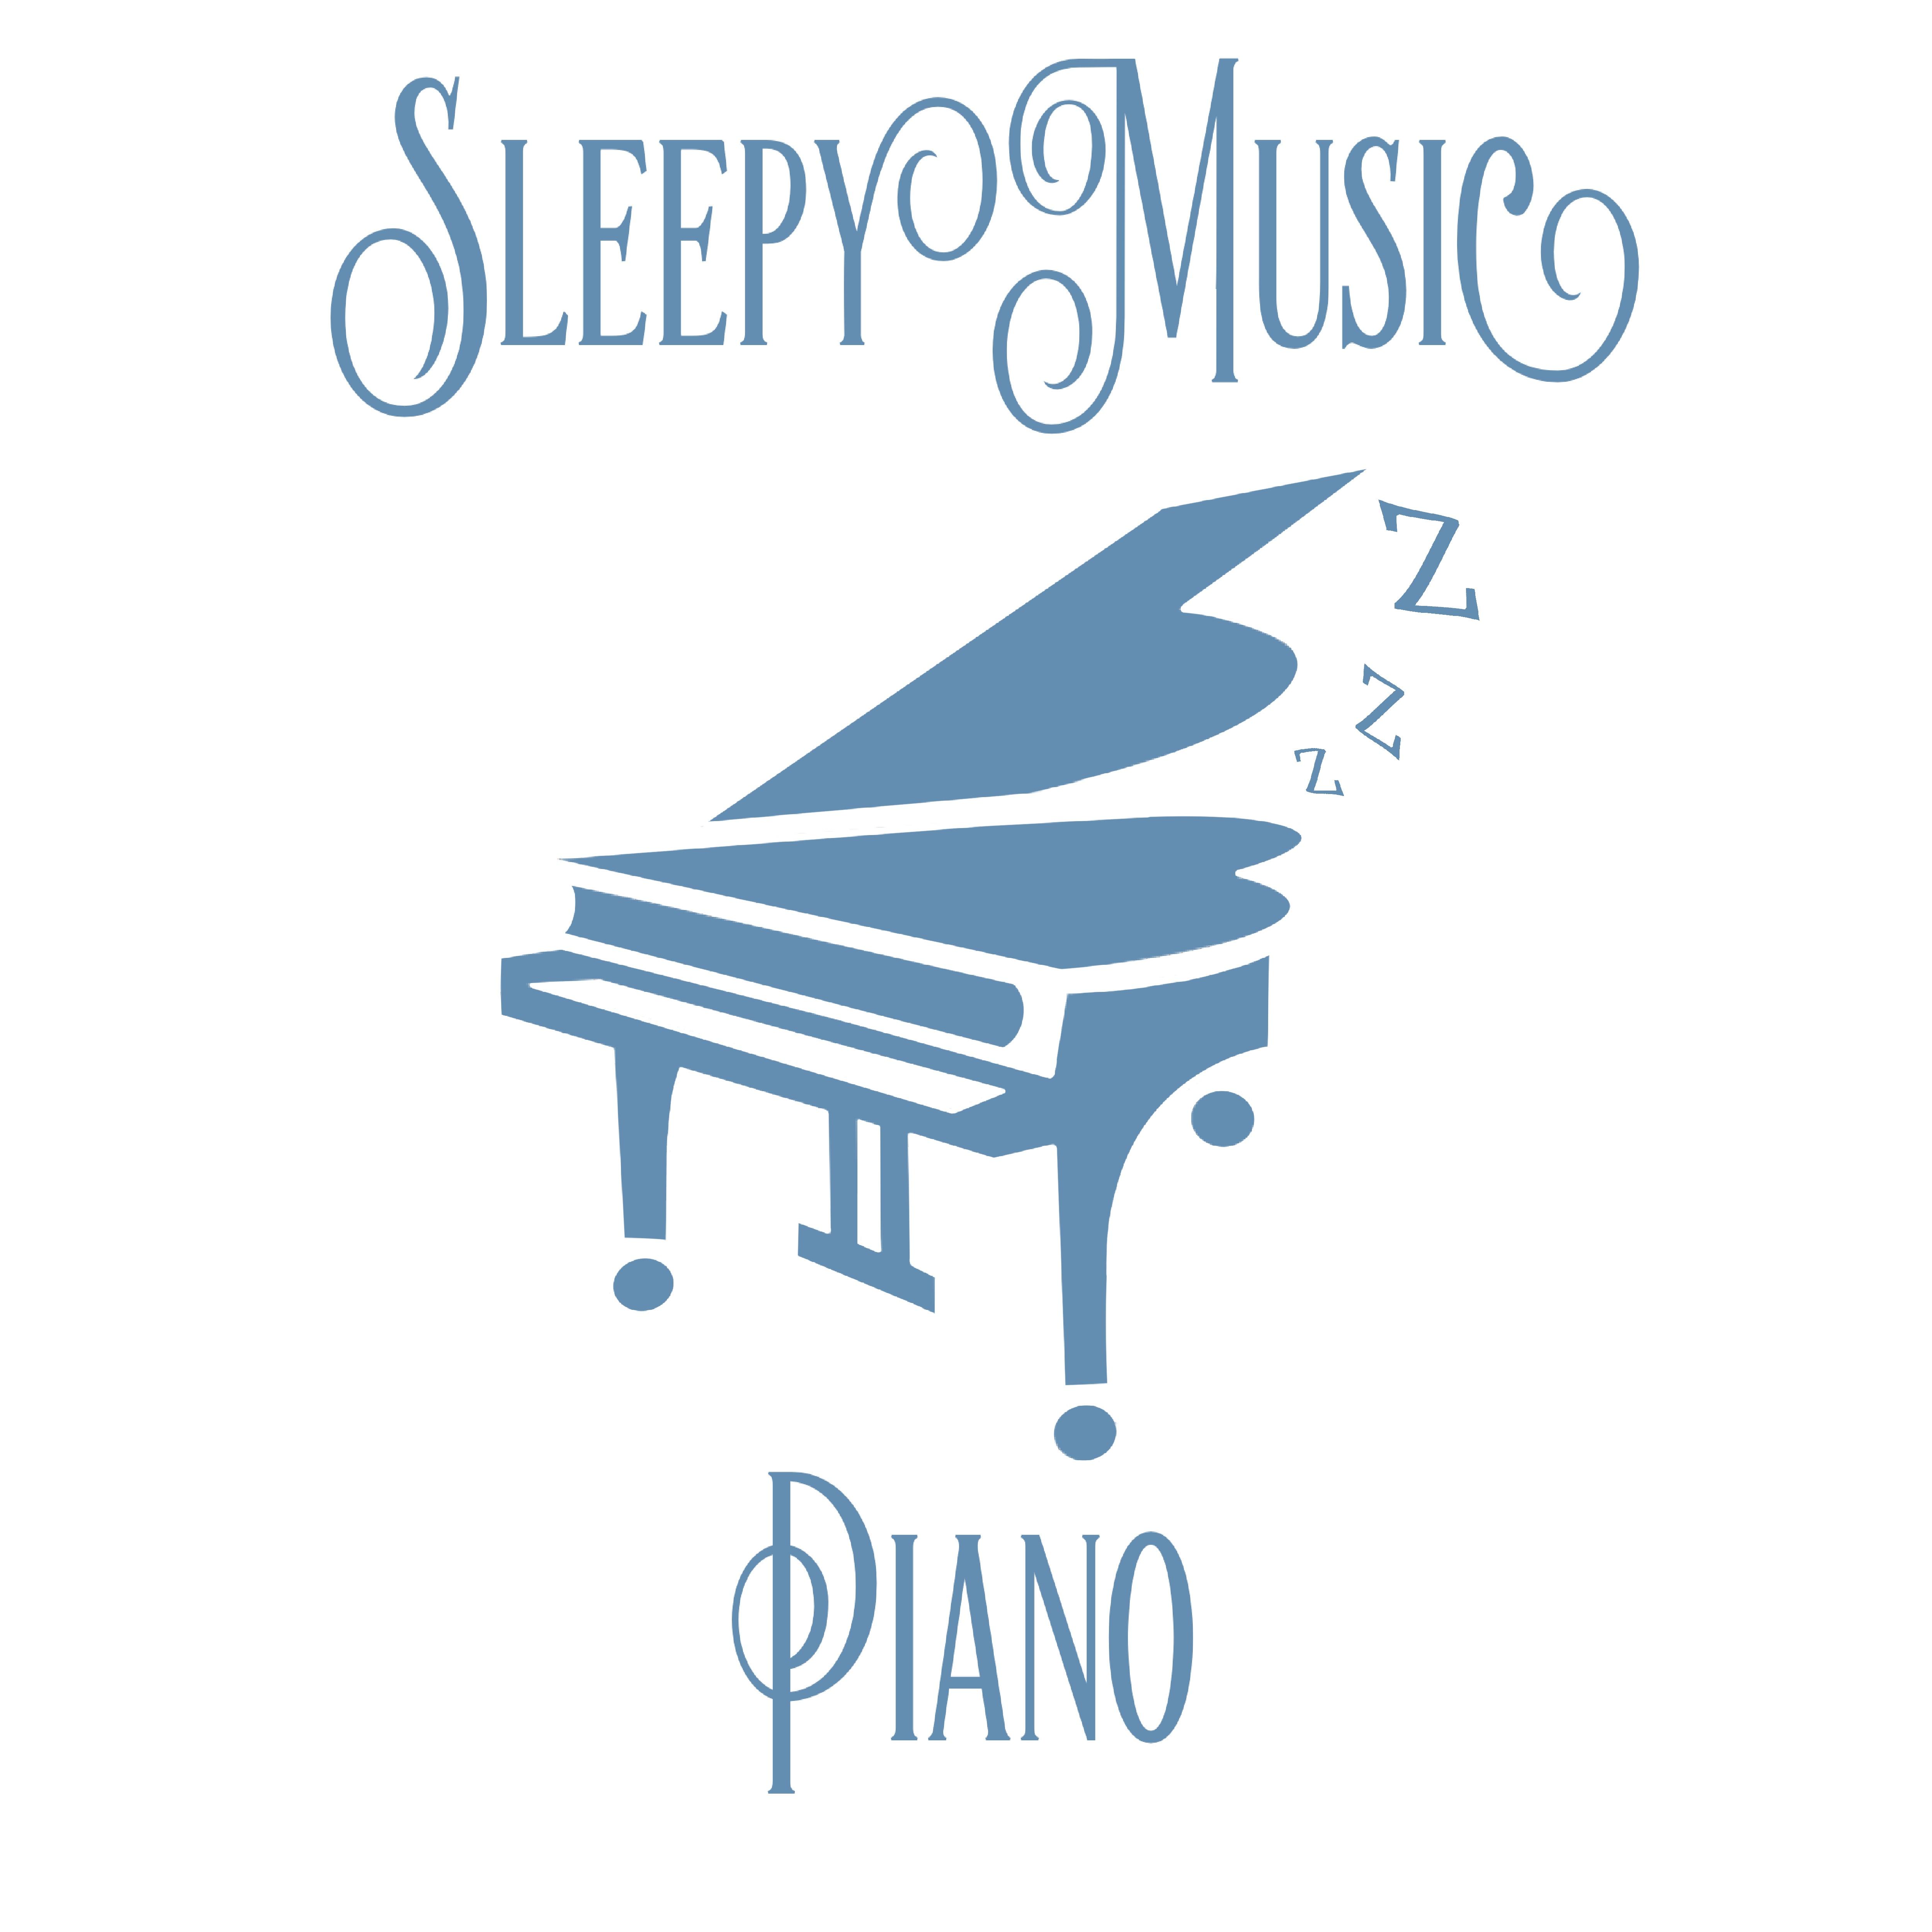 Sleepy Music Piano